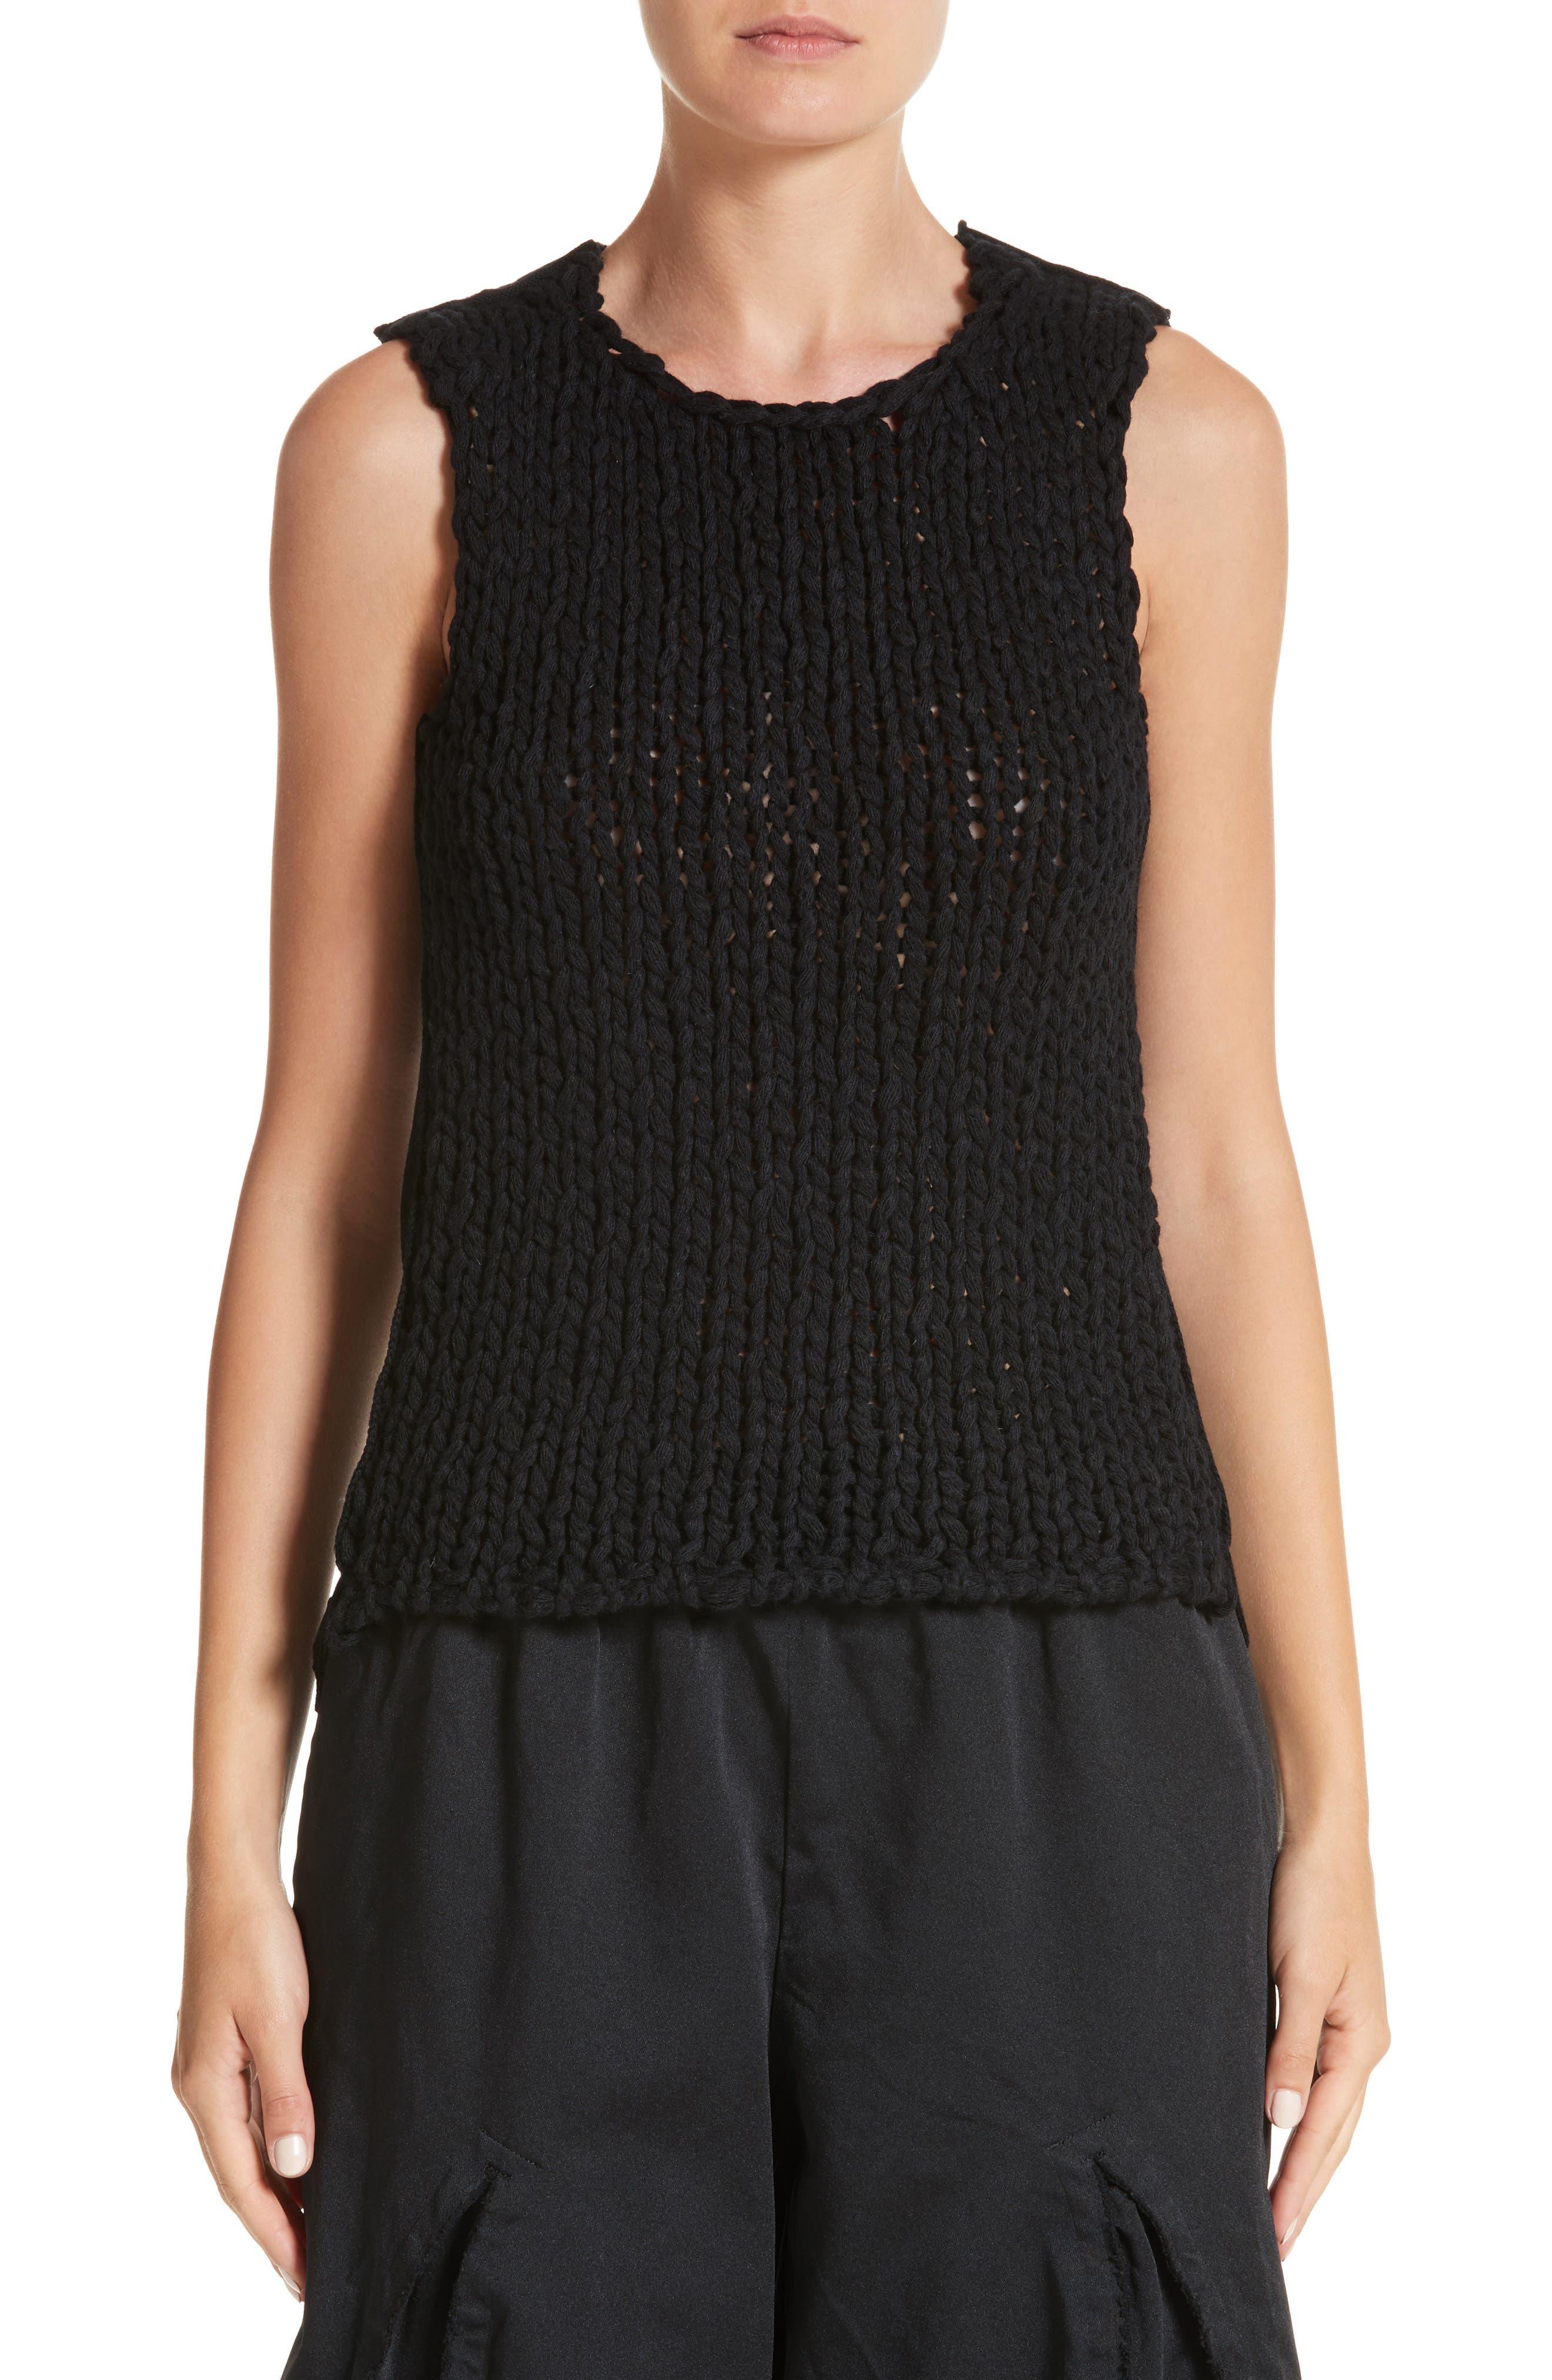 Knit Sleeveless Top,                         Main,                         color, Black/ Black